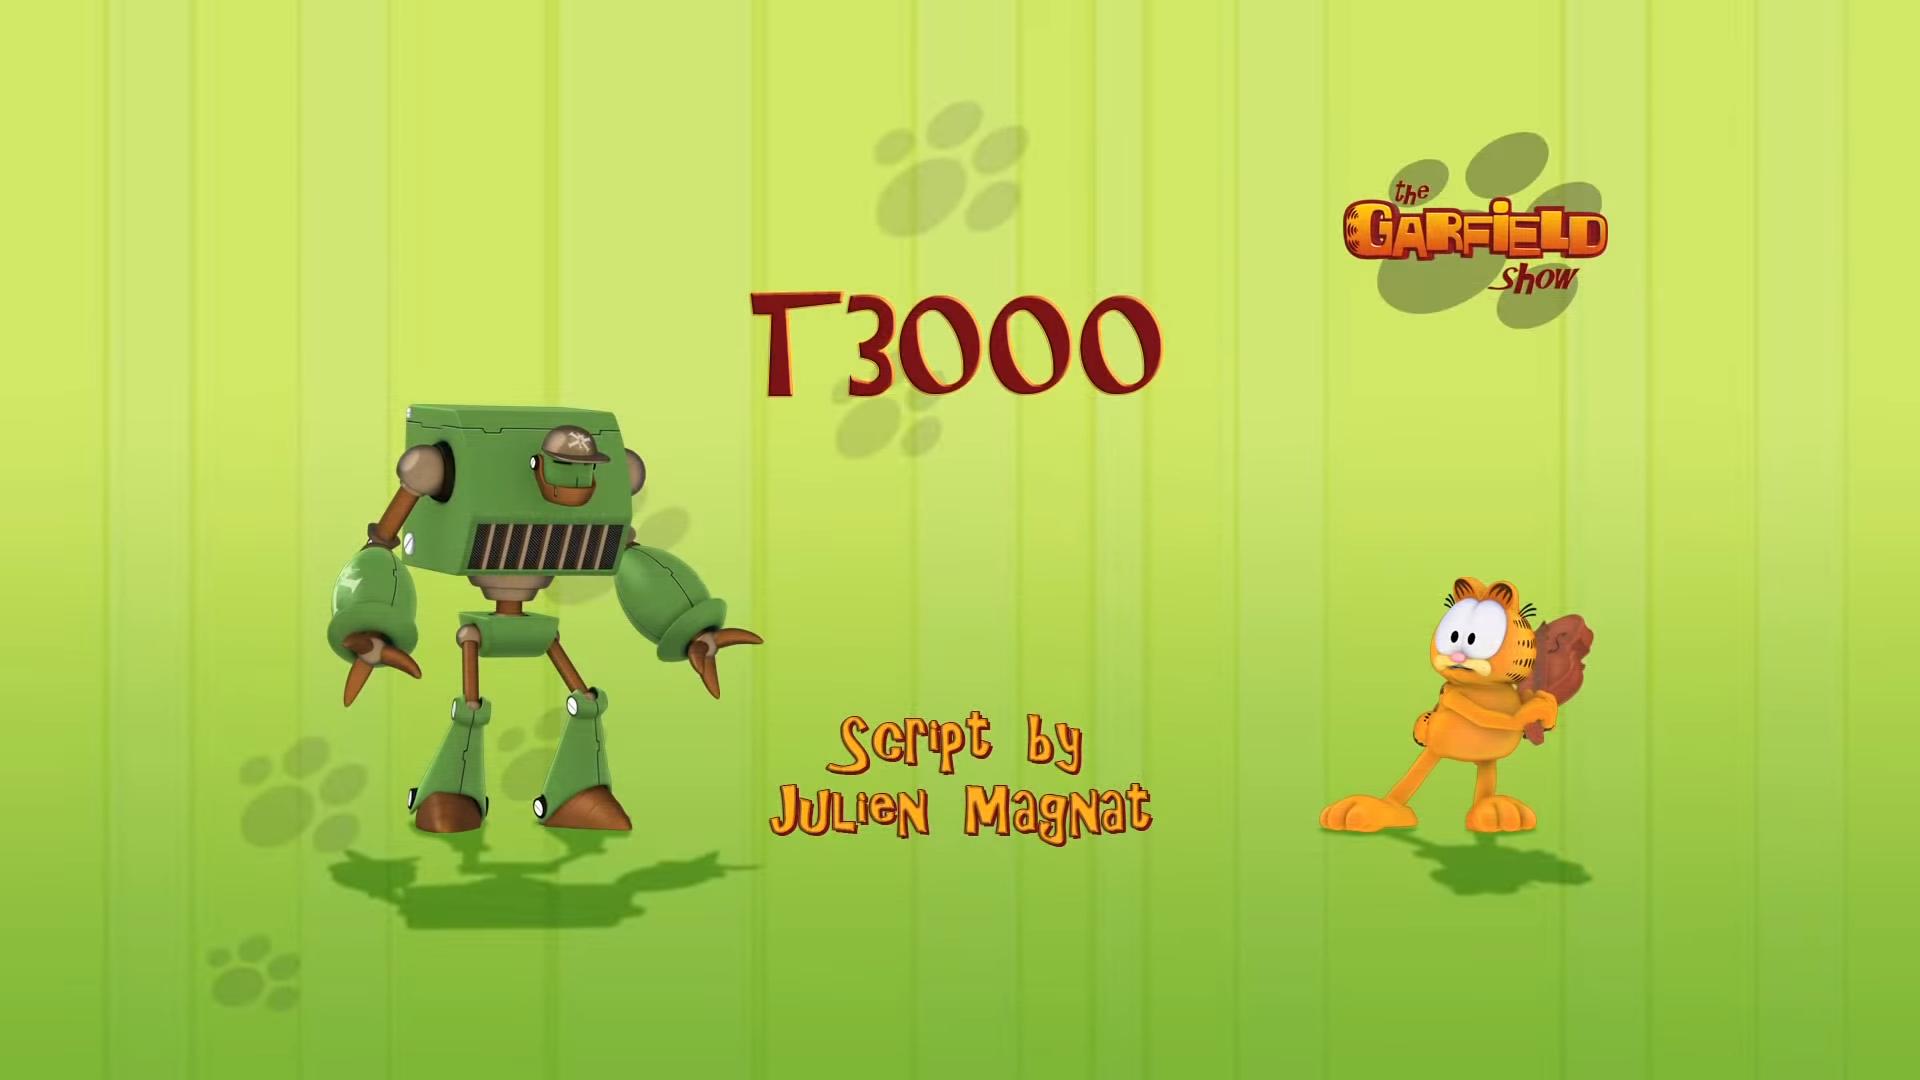 T3000 (Episode)